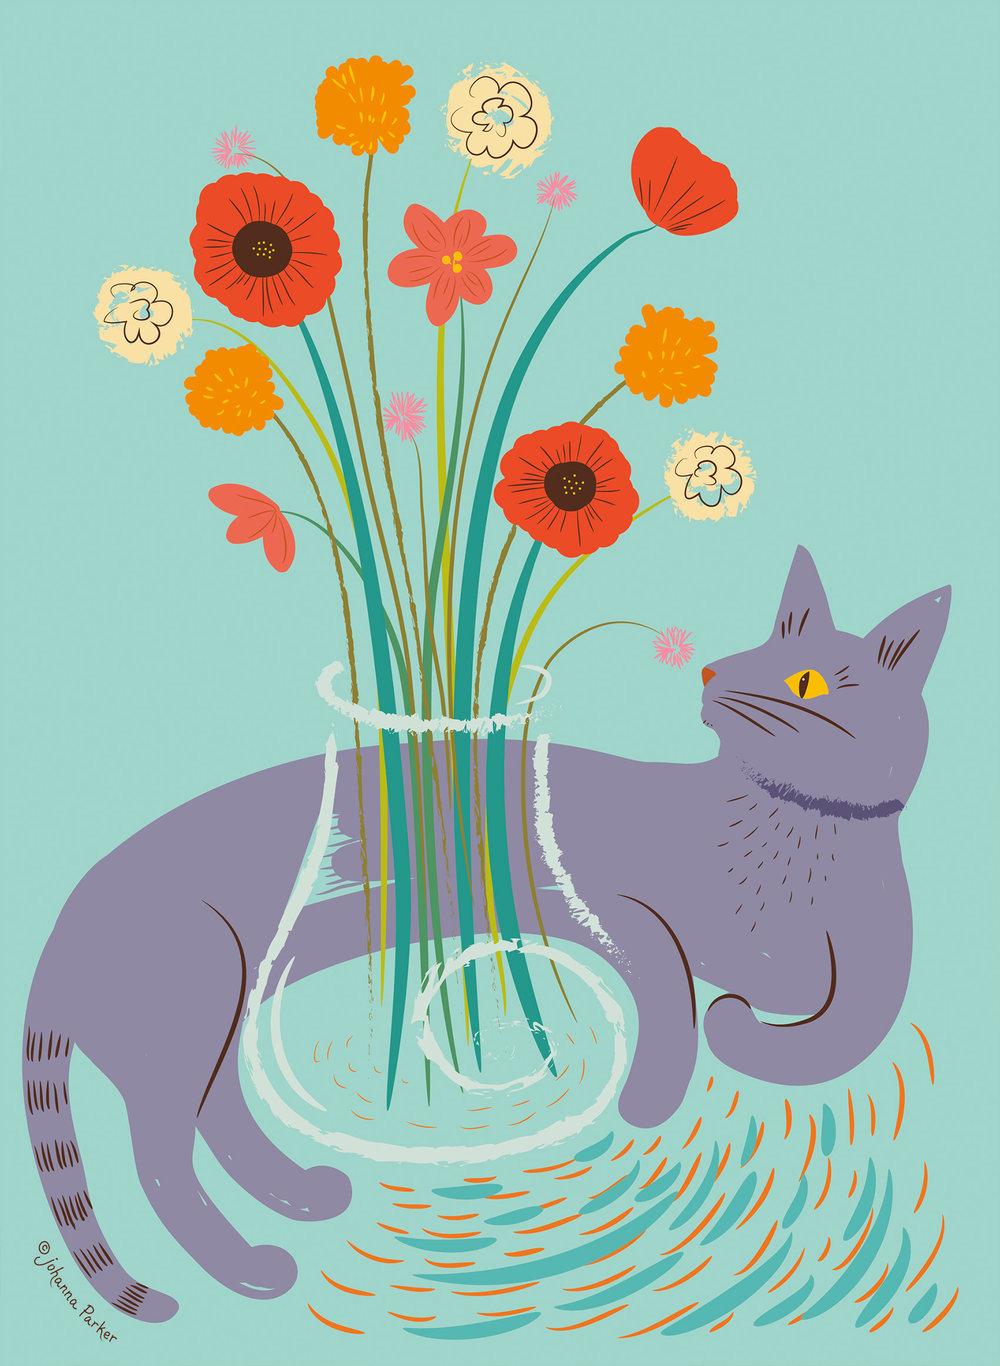 Mischievous purple cat & vase